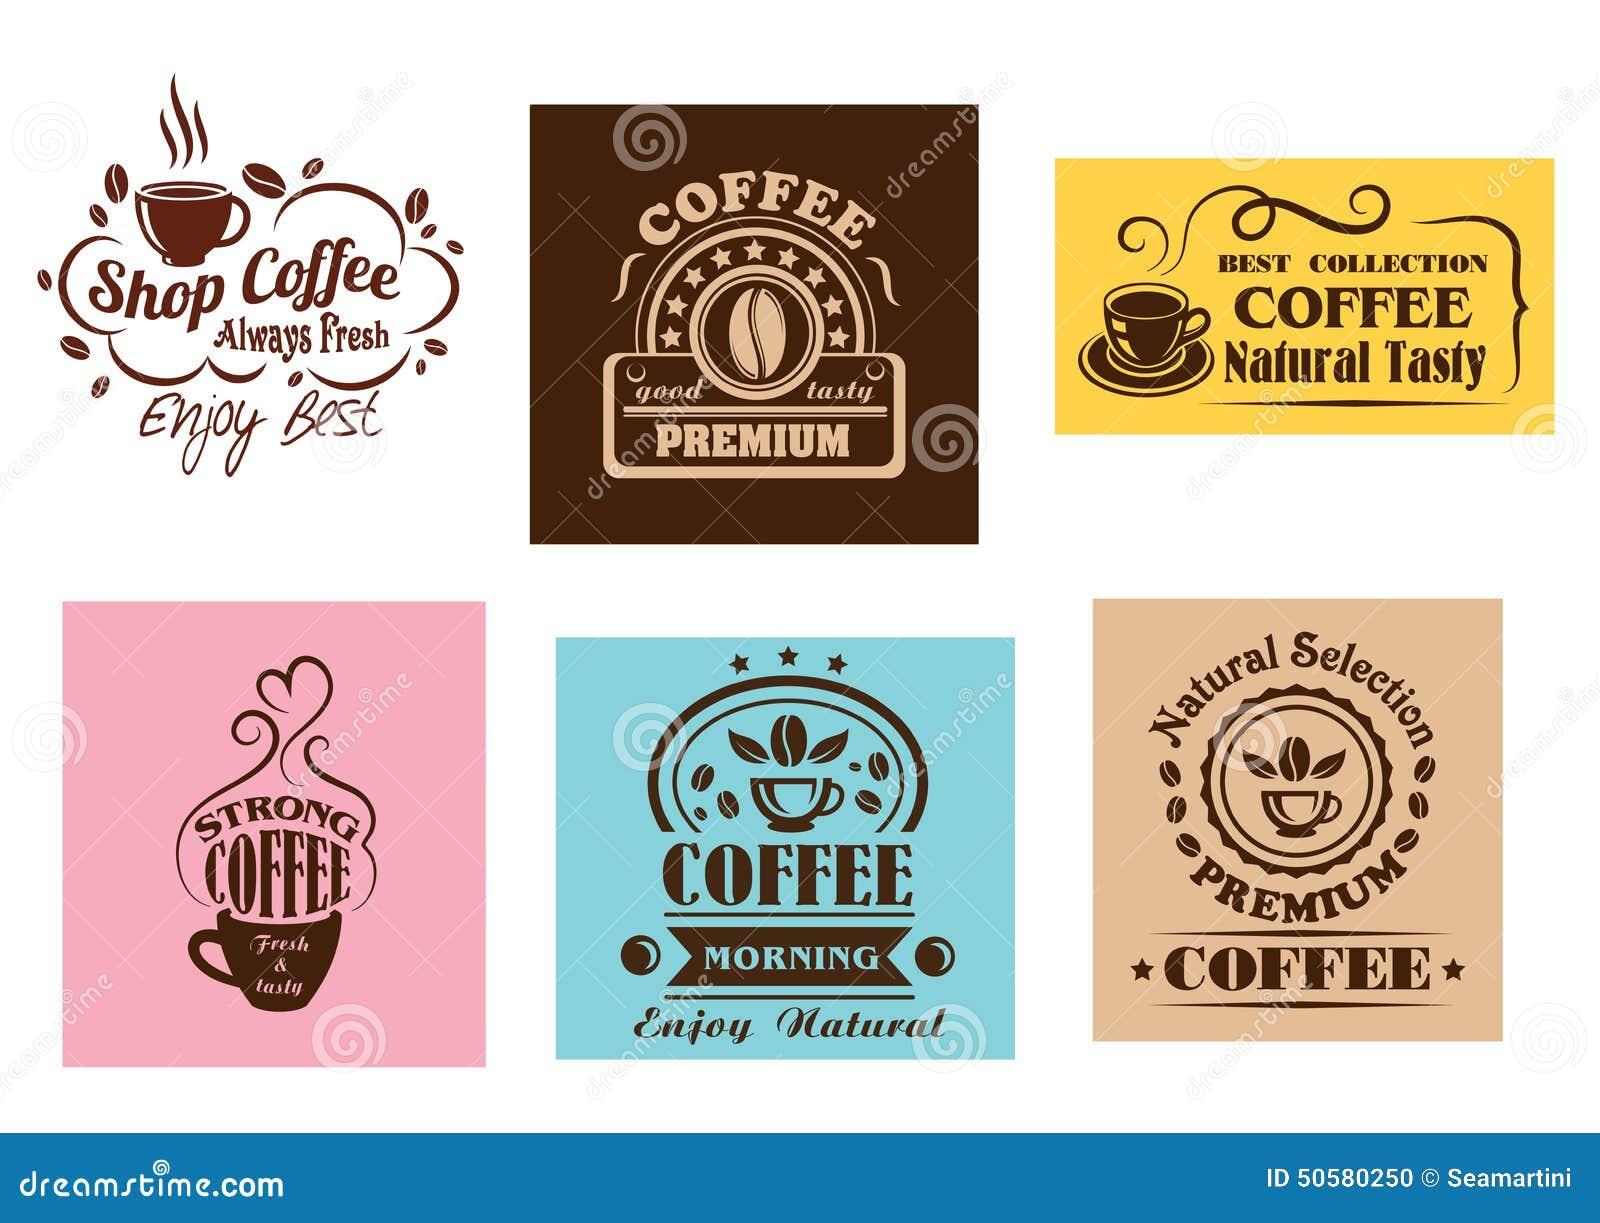 coffee mug template